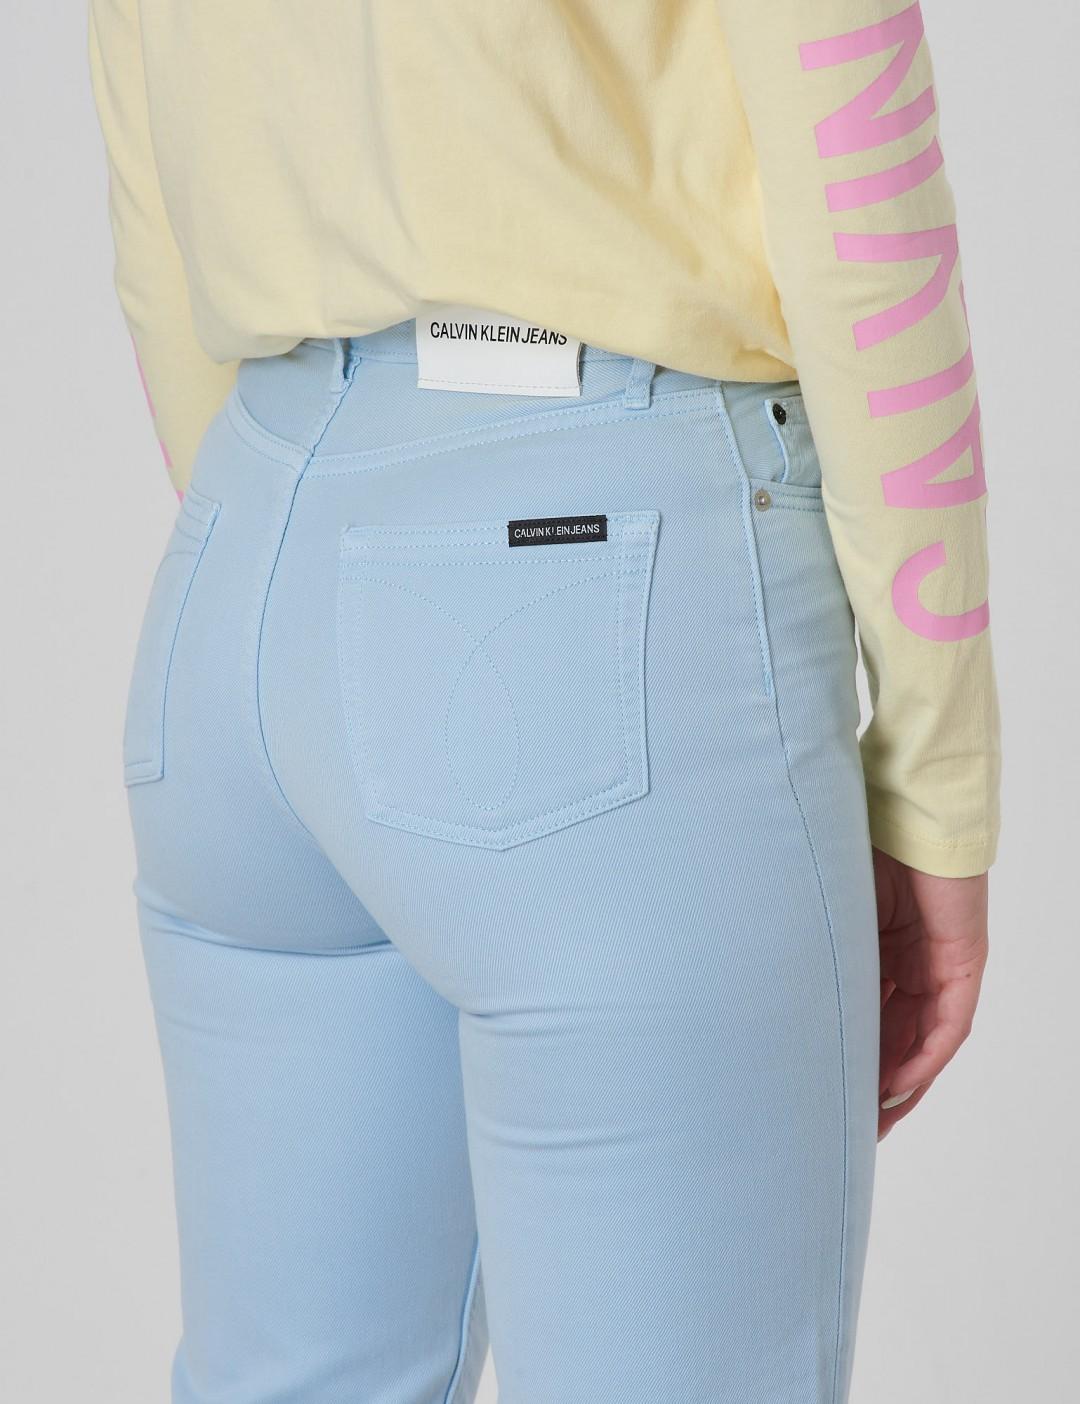 5c14b8844c35 Om Relaxed Hr Ankle Colored Soft Gd - Blå från Calvin Klein ...